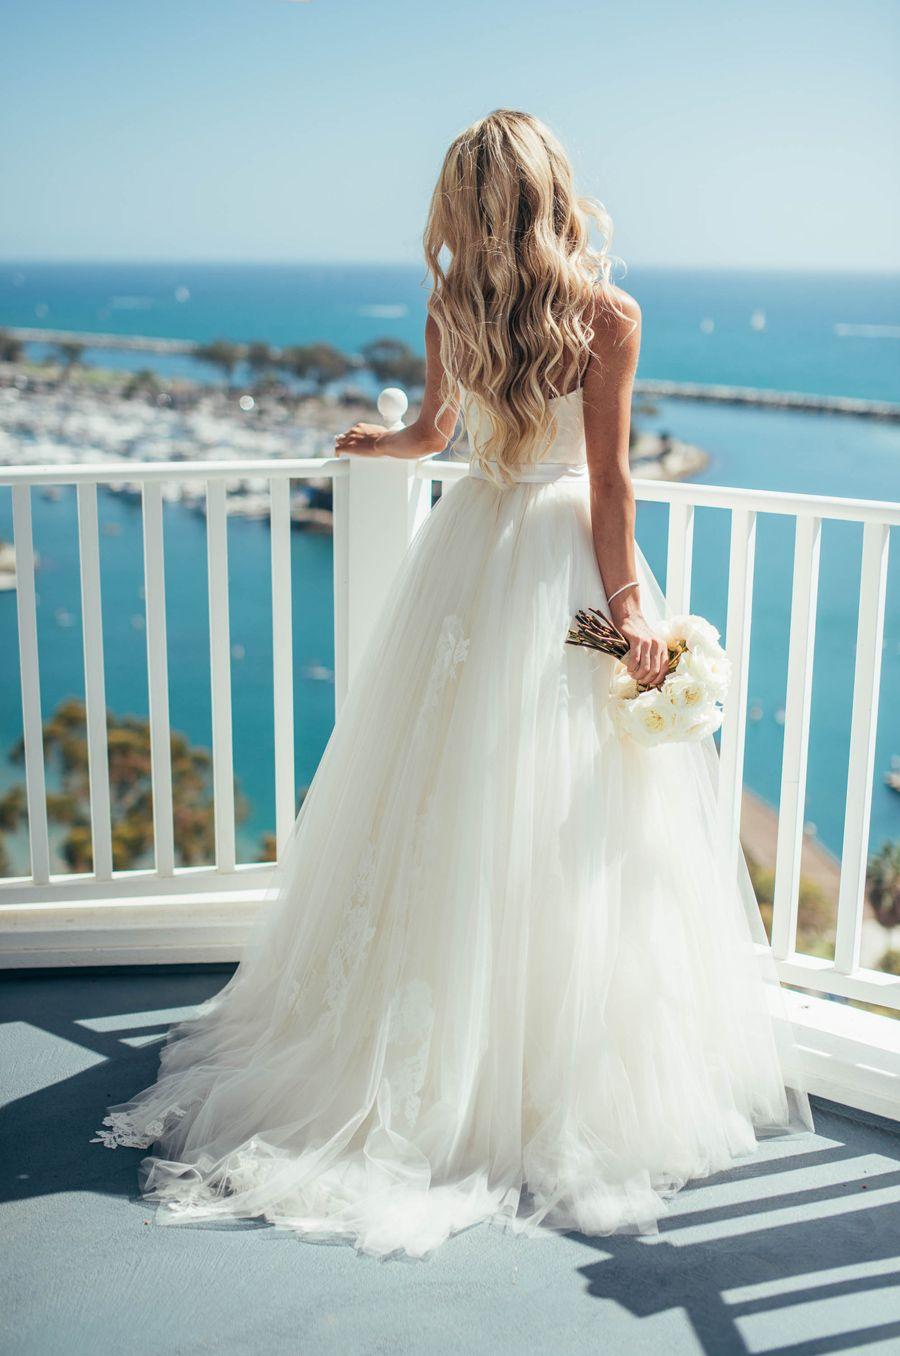 Vitaly M Photography: Tanya and Andrey (Dana Point, LA) | Wedding ...